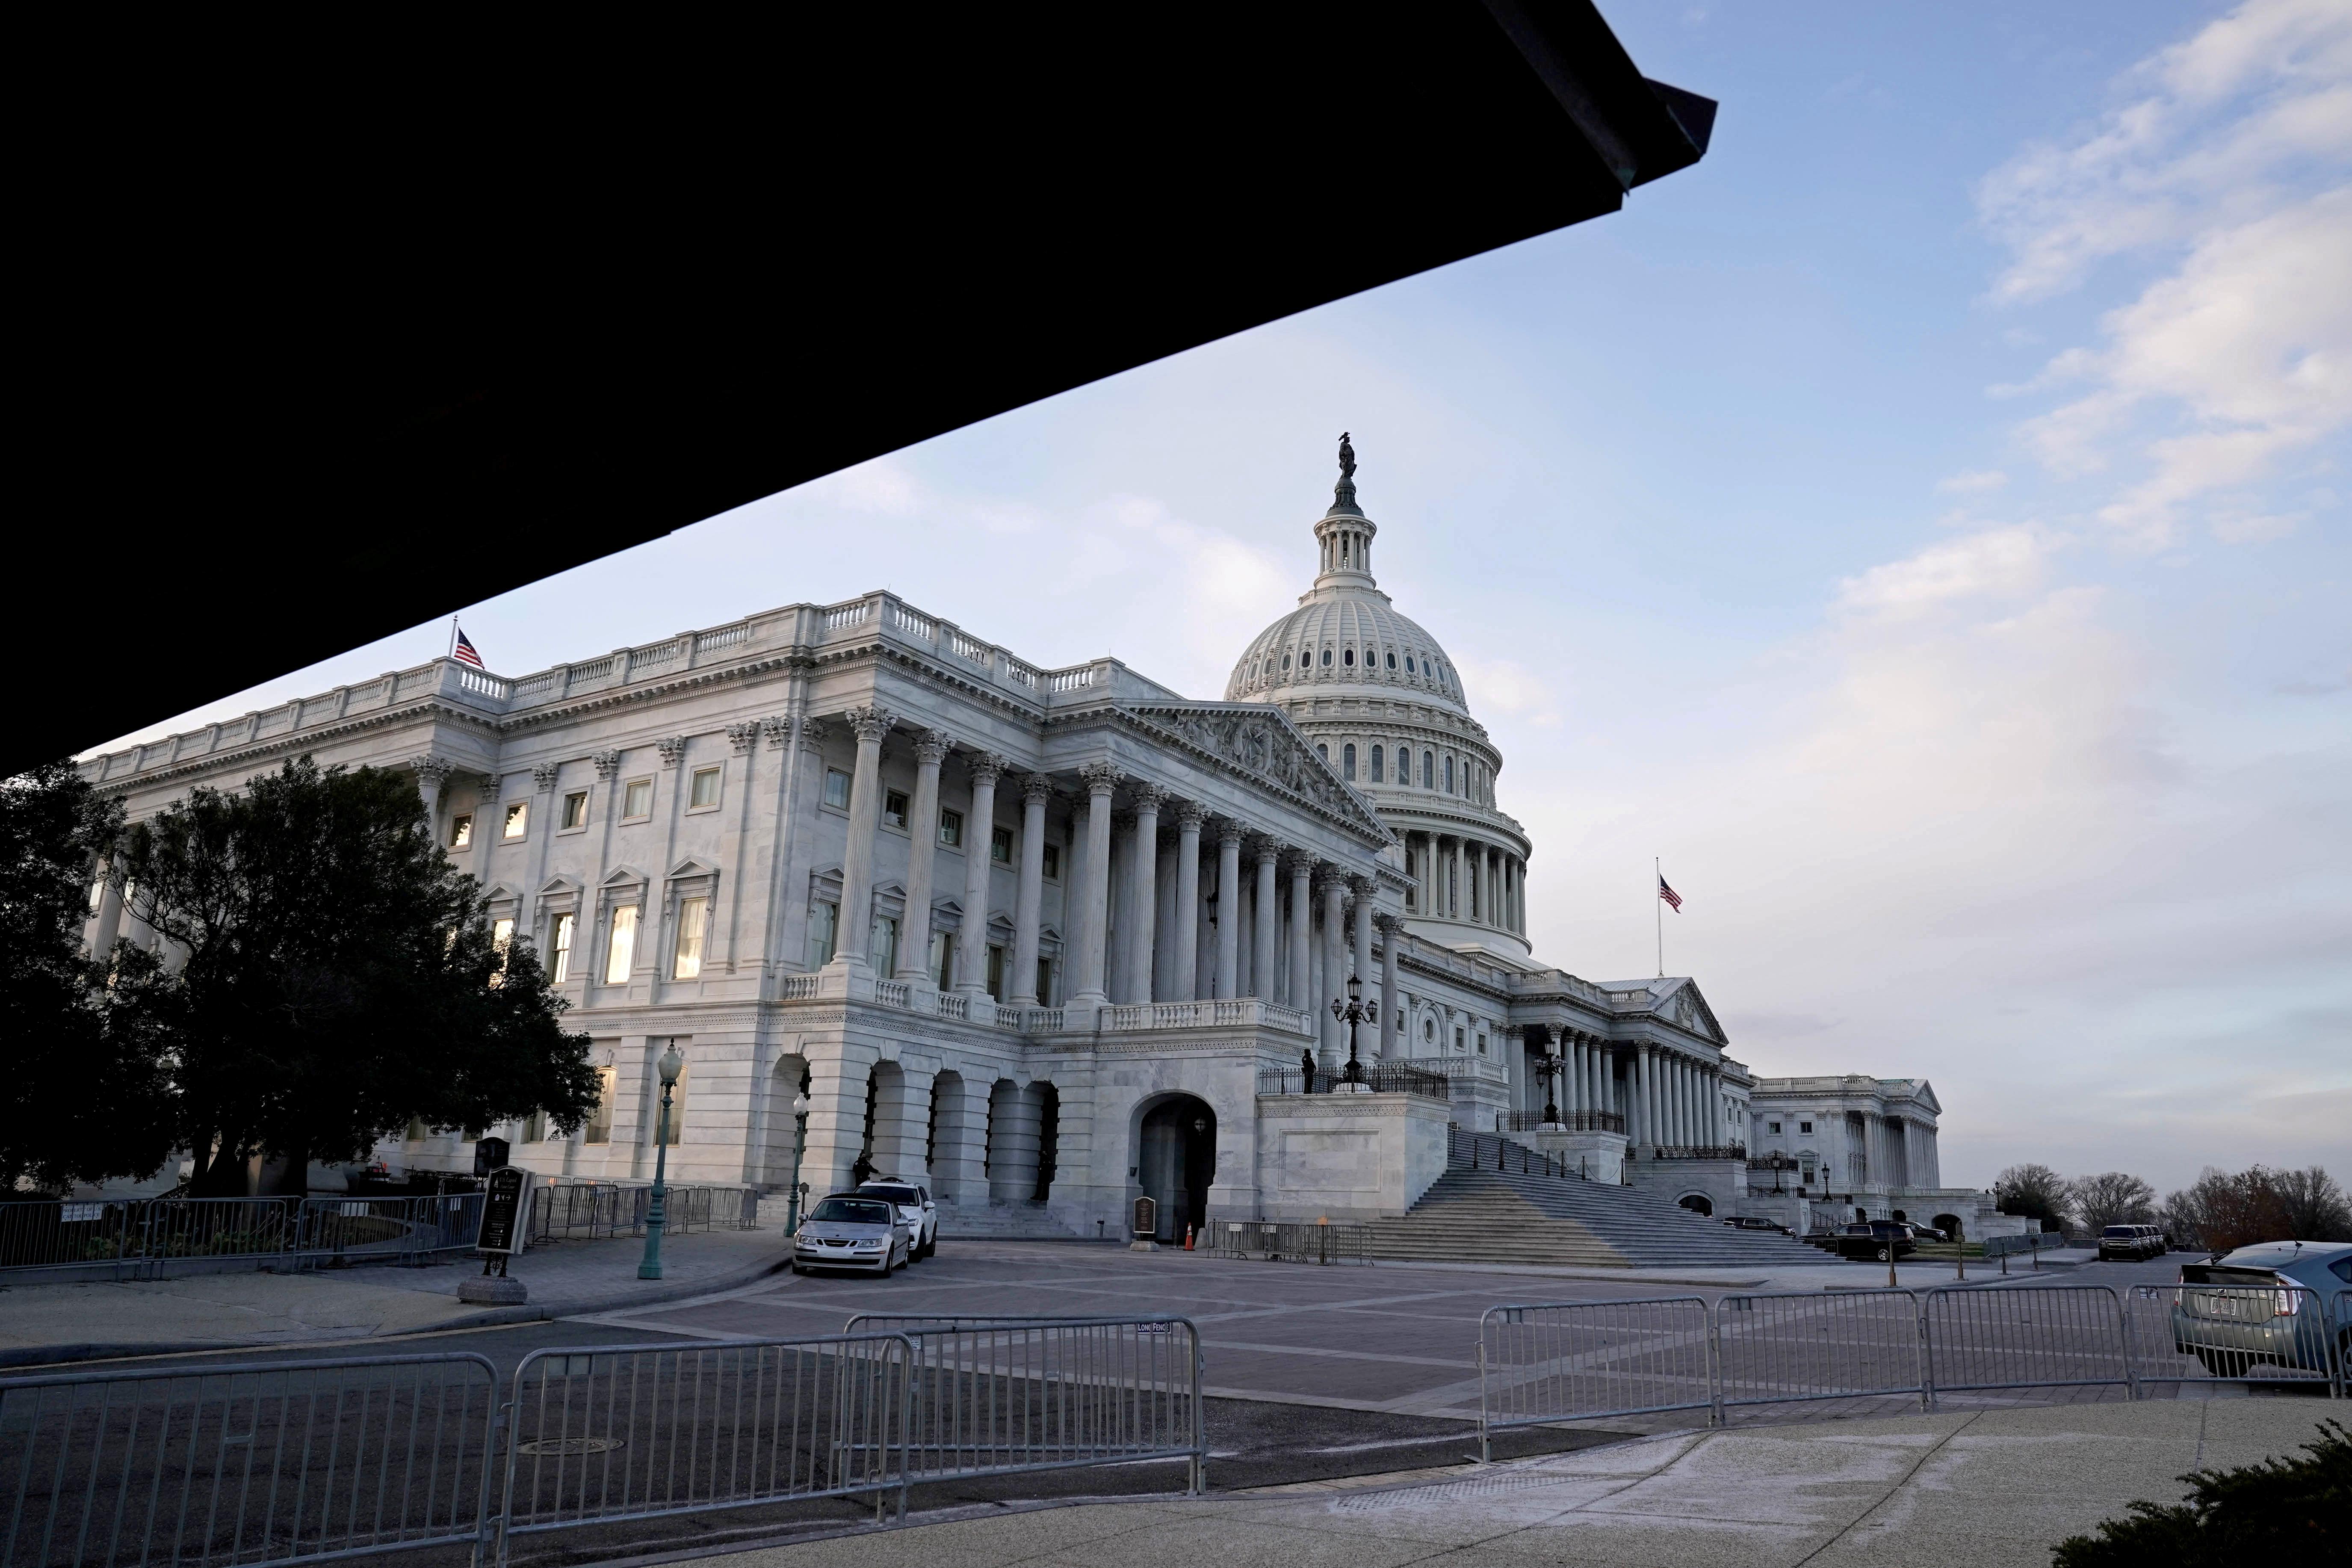 A view of the U.S. Capitol Building in Washington, D.C., U.S. December 21, 2020. REUTERS/Ken Cedeno